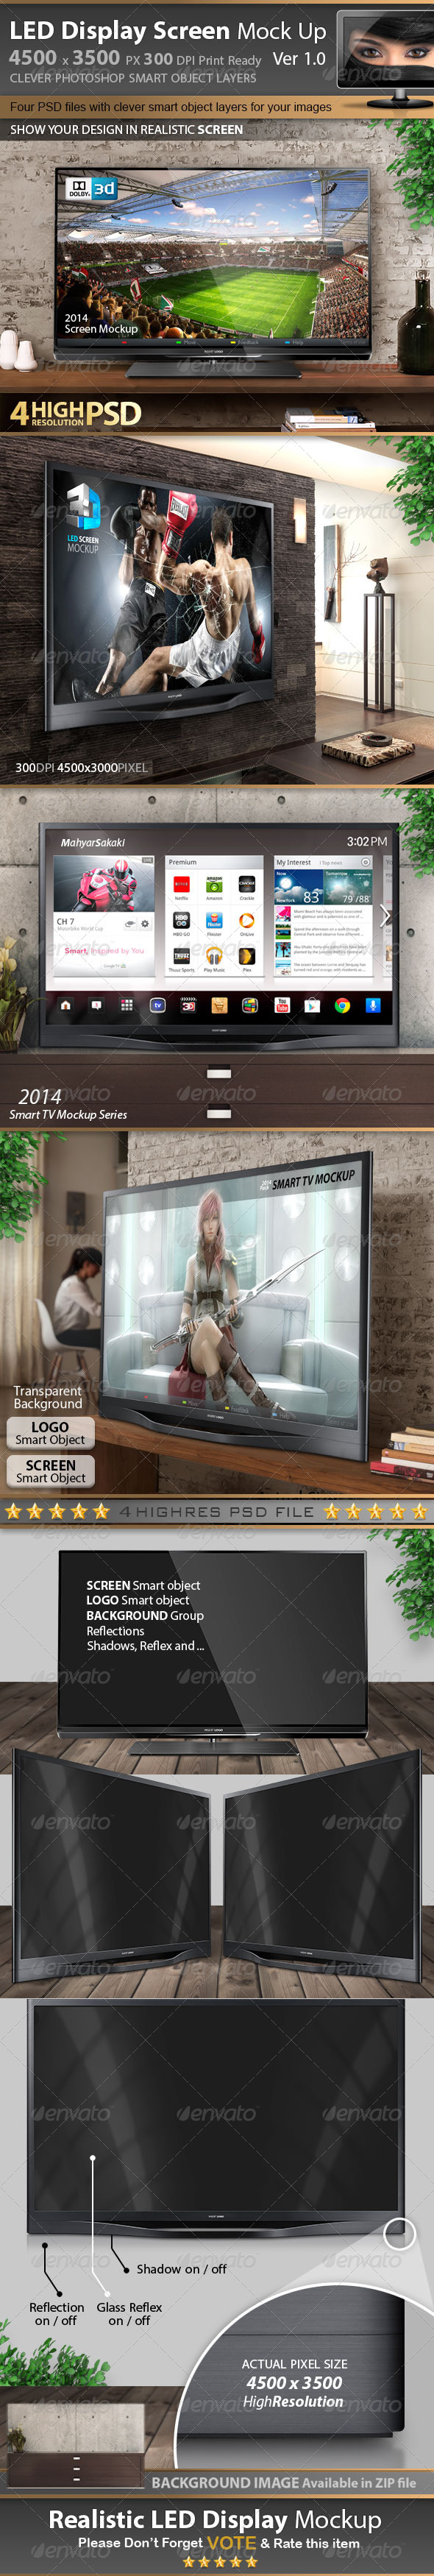 GraphicRiver Smart LED Display Screen Mockup V1 7105796